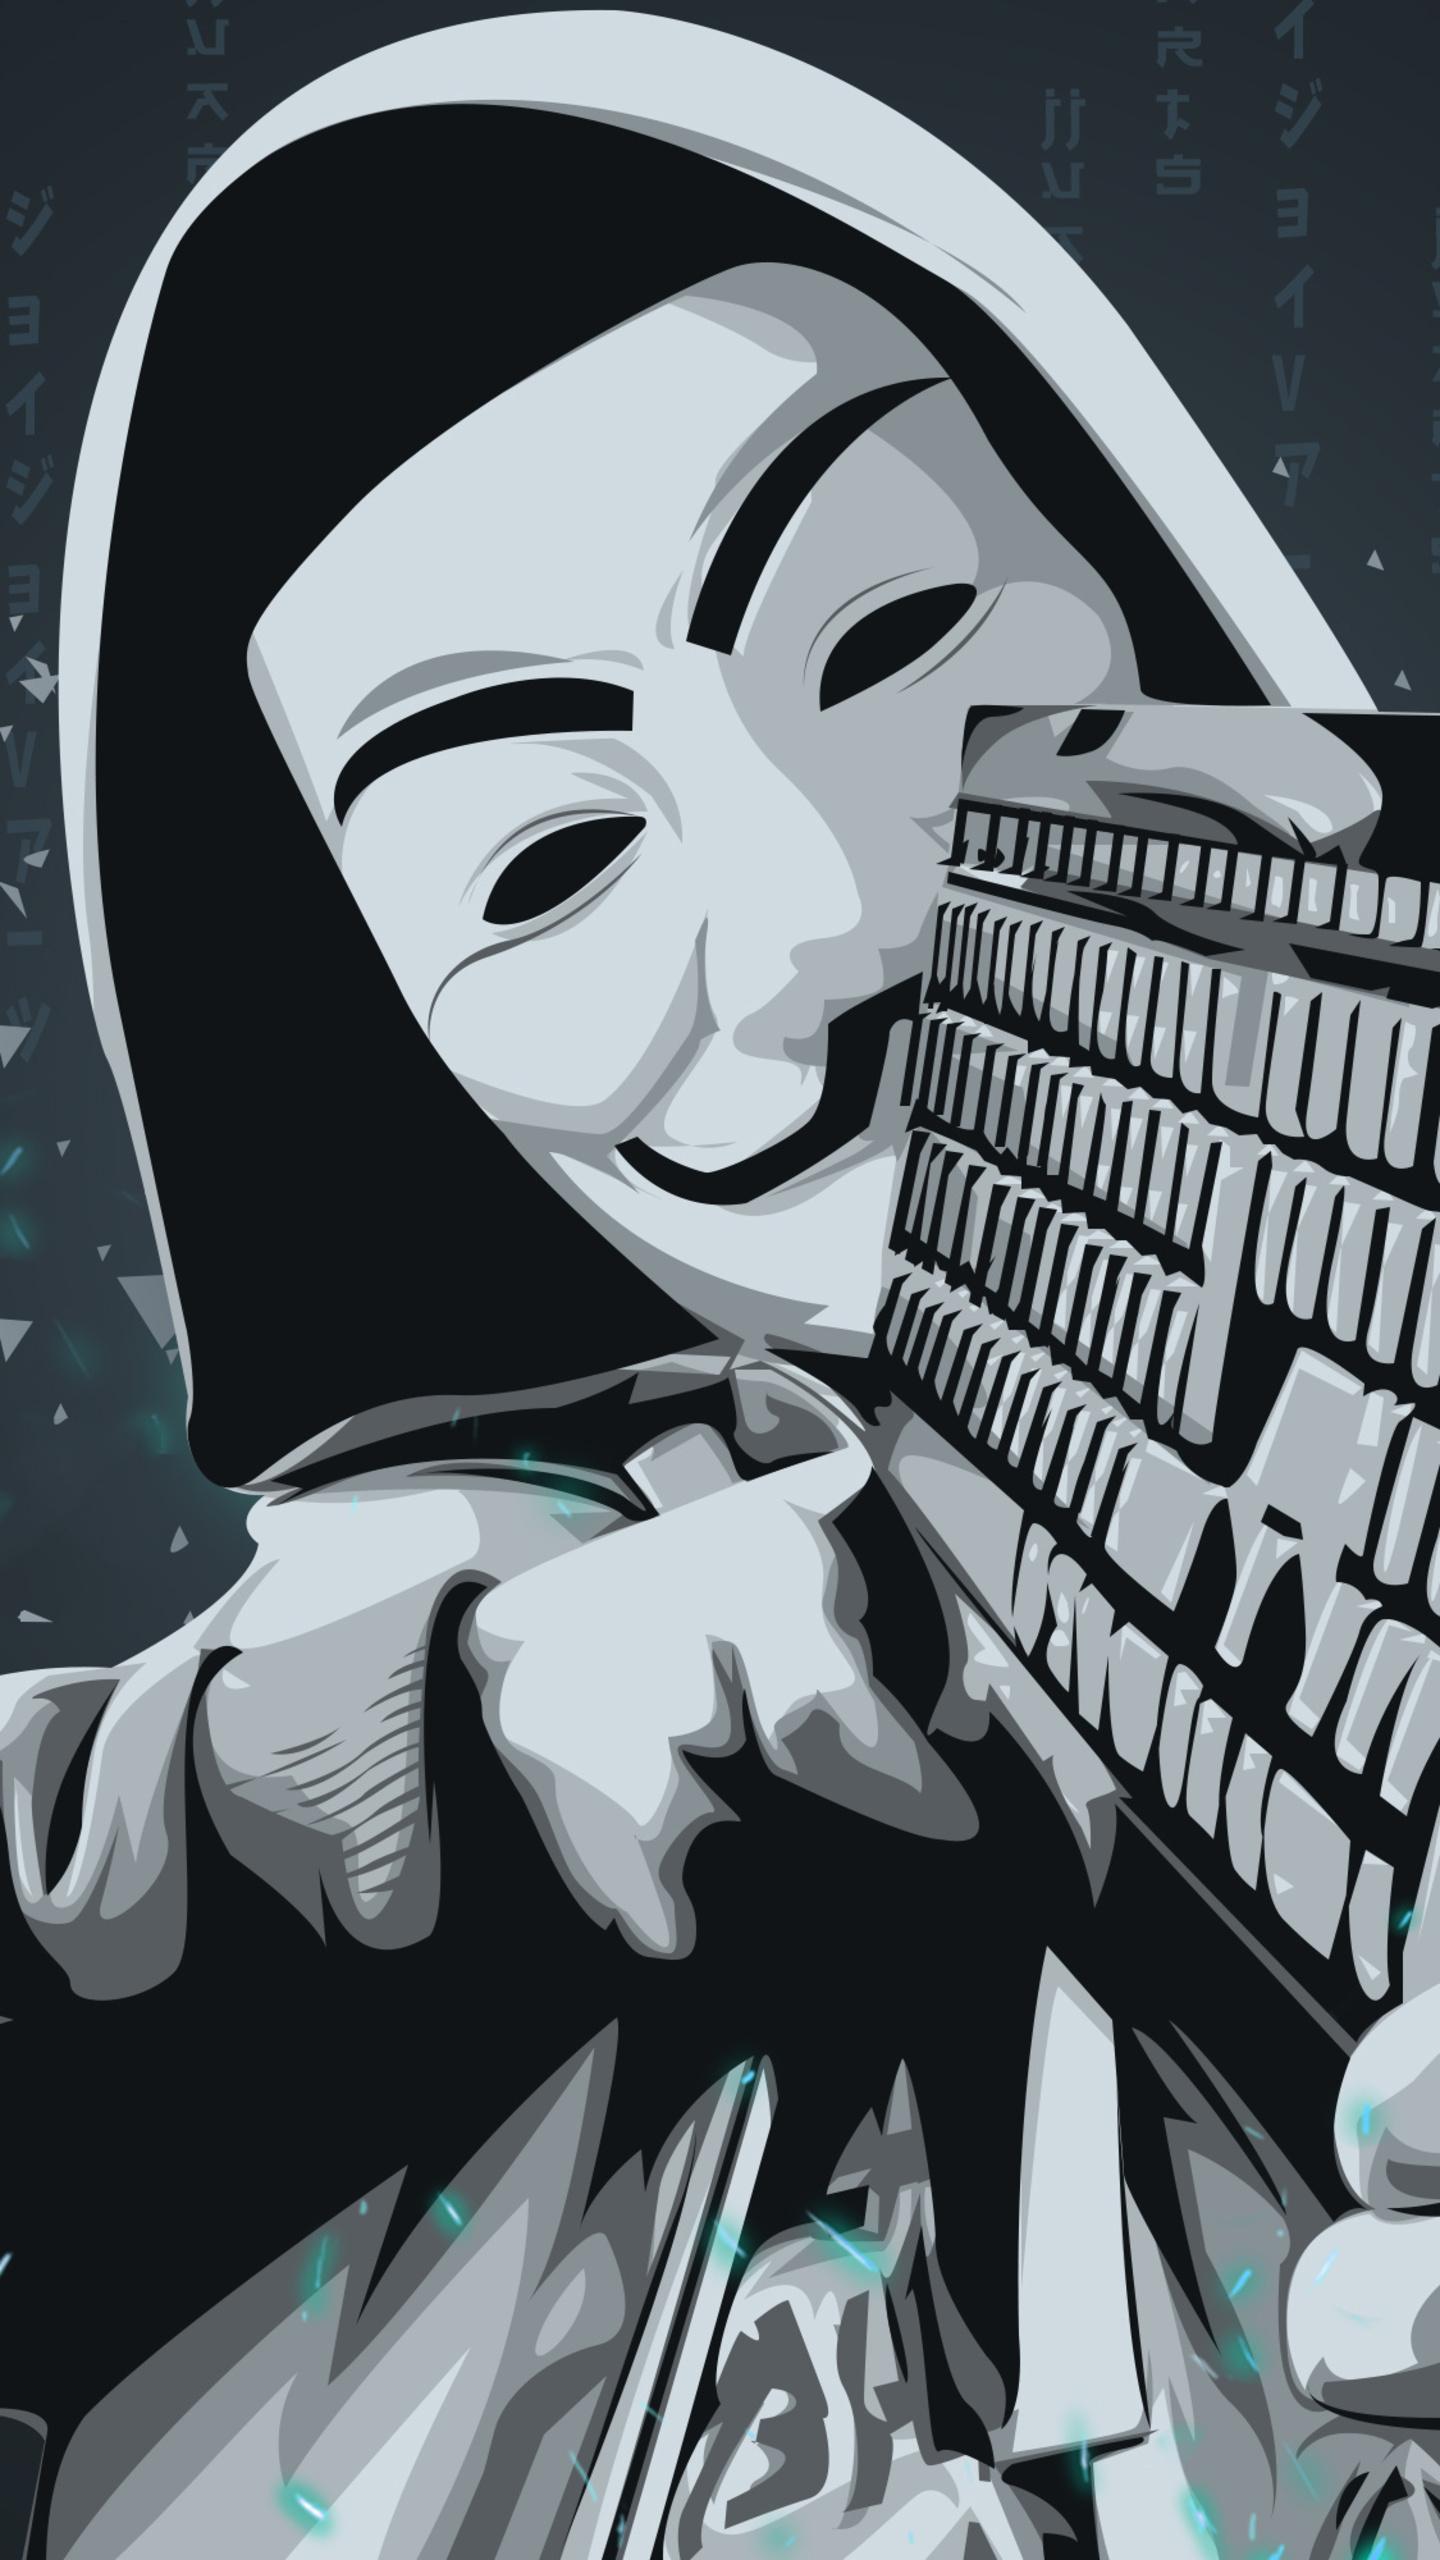 anonymous-vector-x-vexel-art-nx.jpg